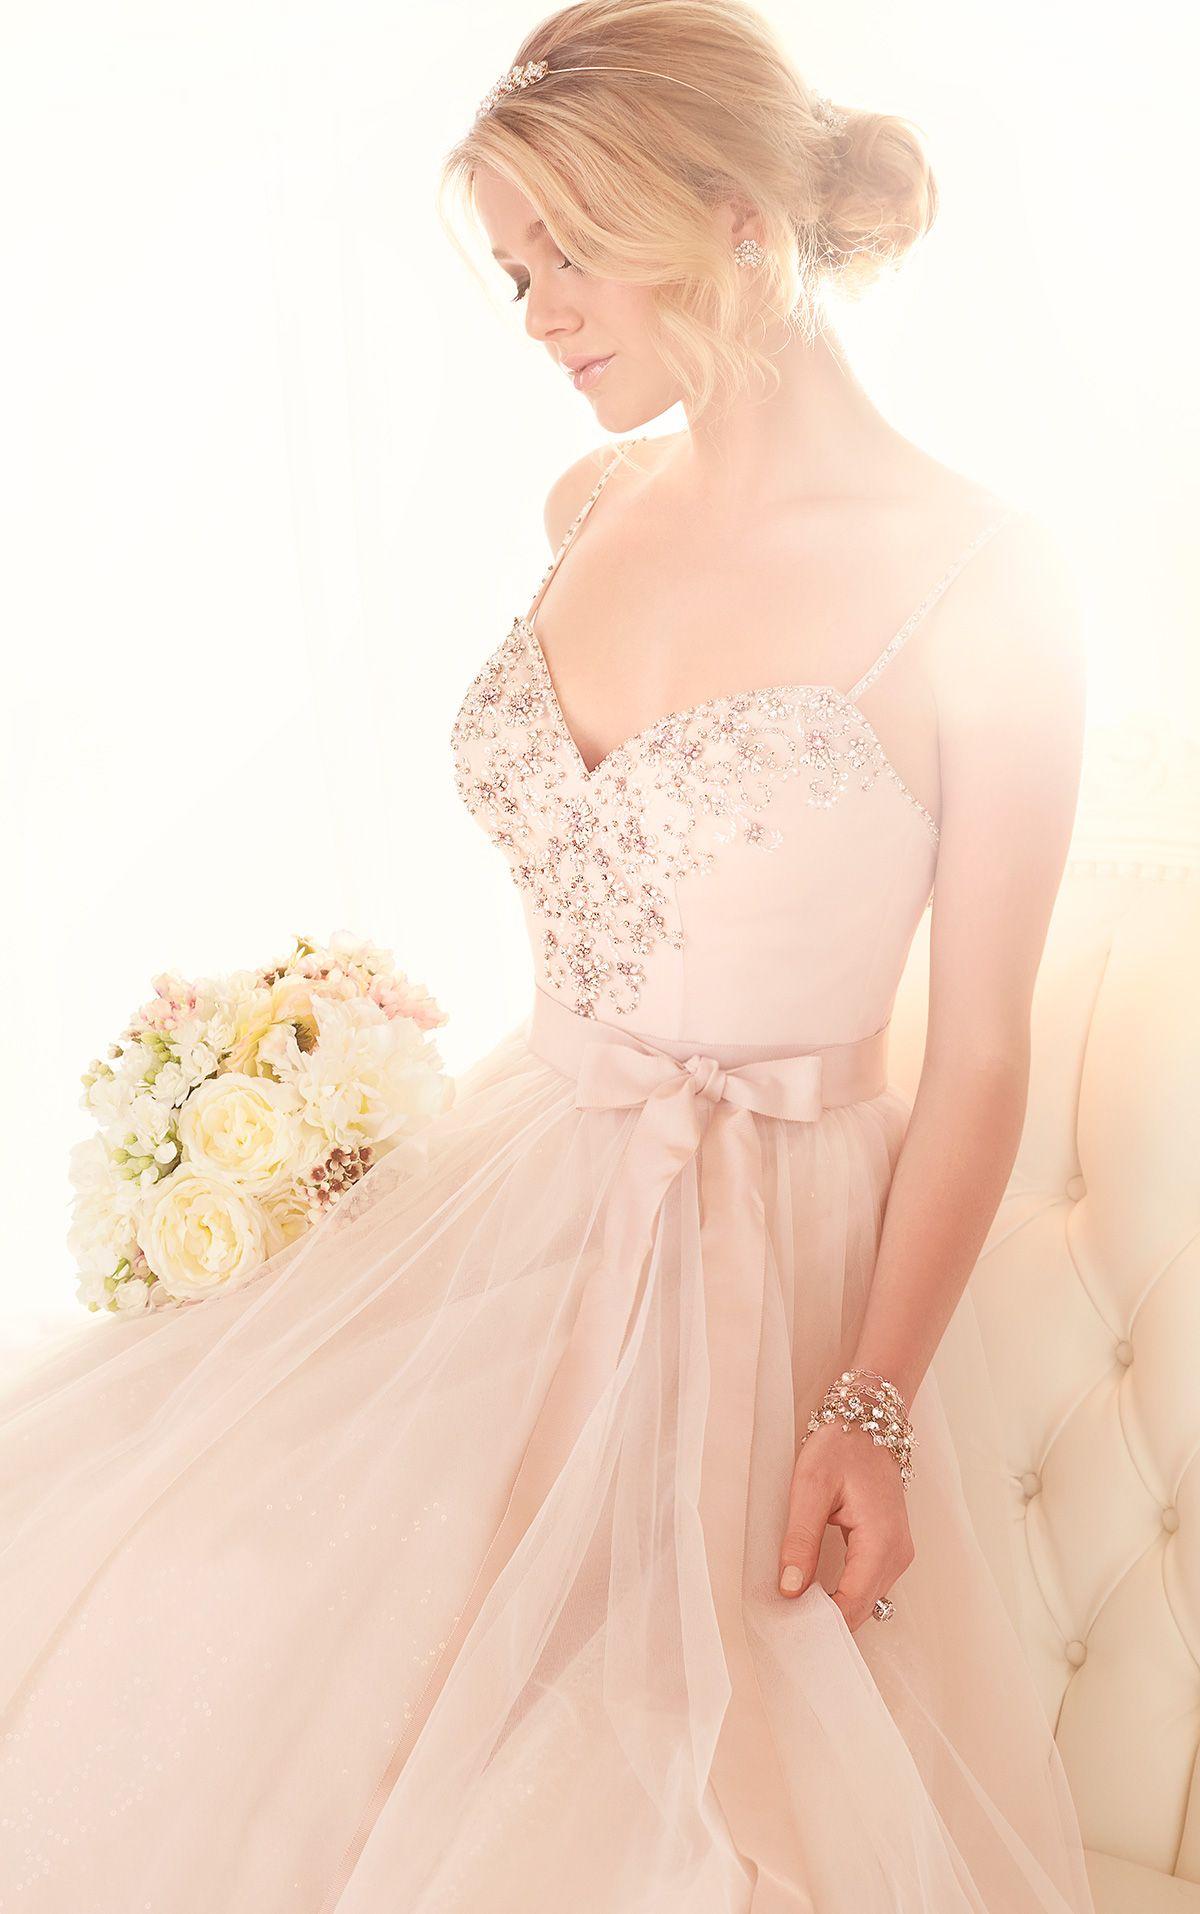 Sweetheart neckline wedding gown from essense of australia style